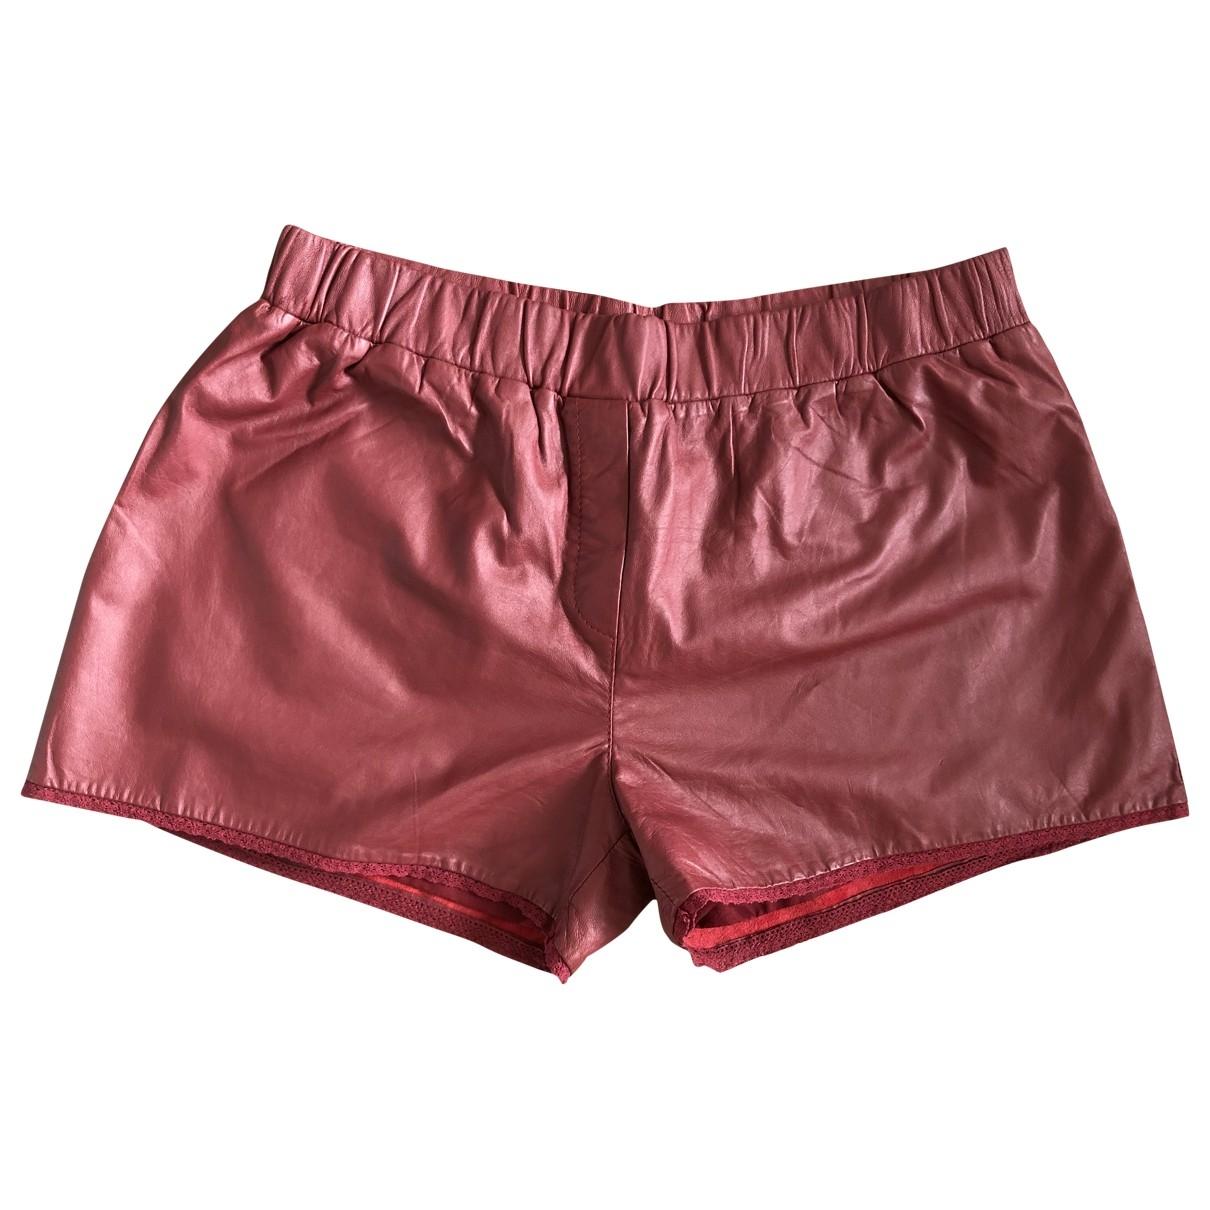 Bel Air \N Burgundy Leather Shorts for Women 3 0-5